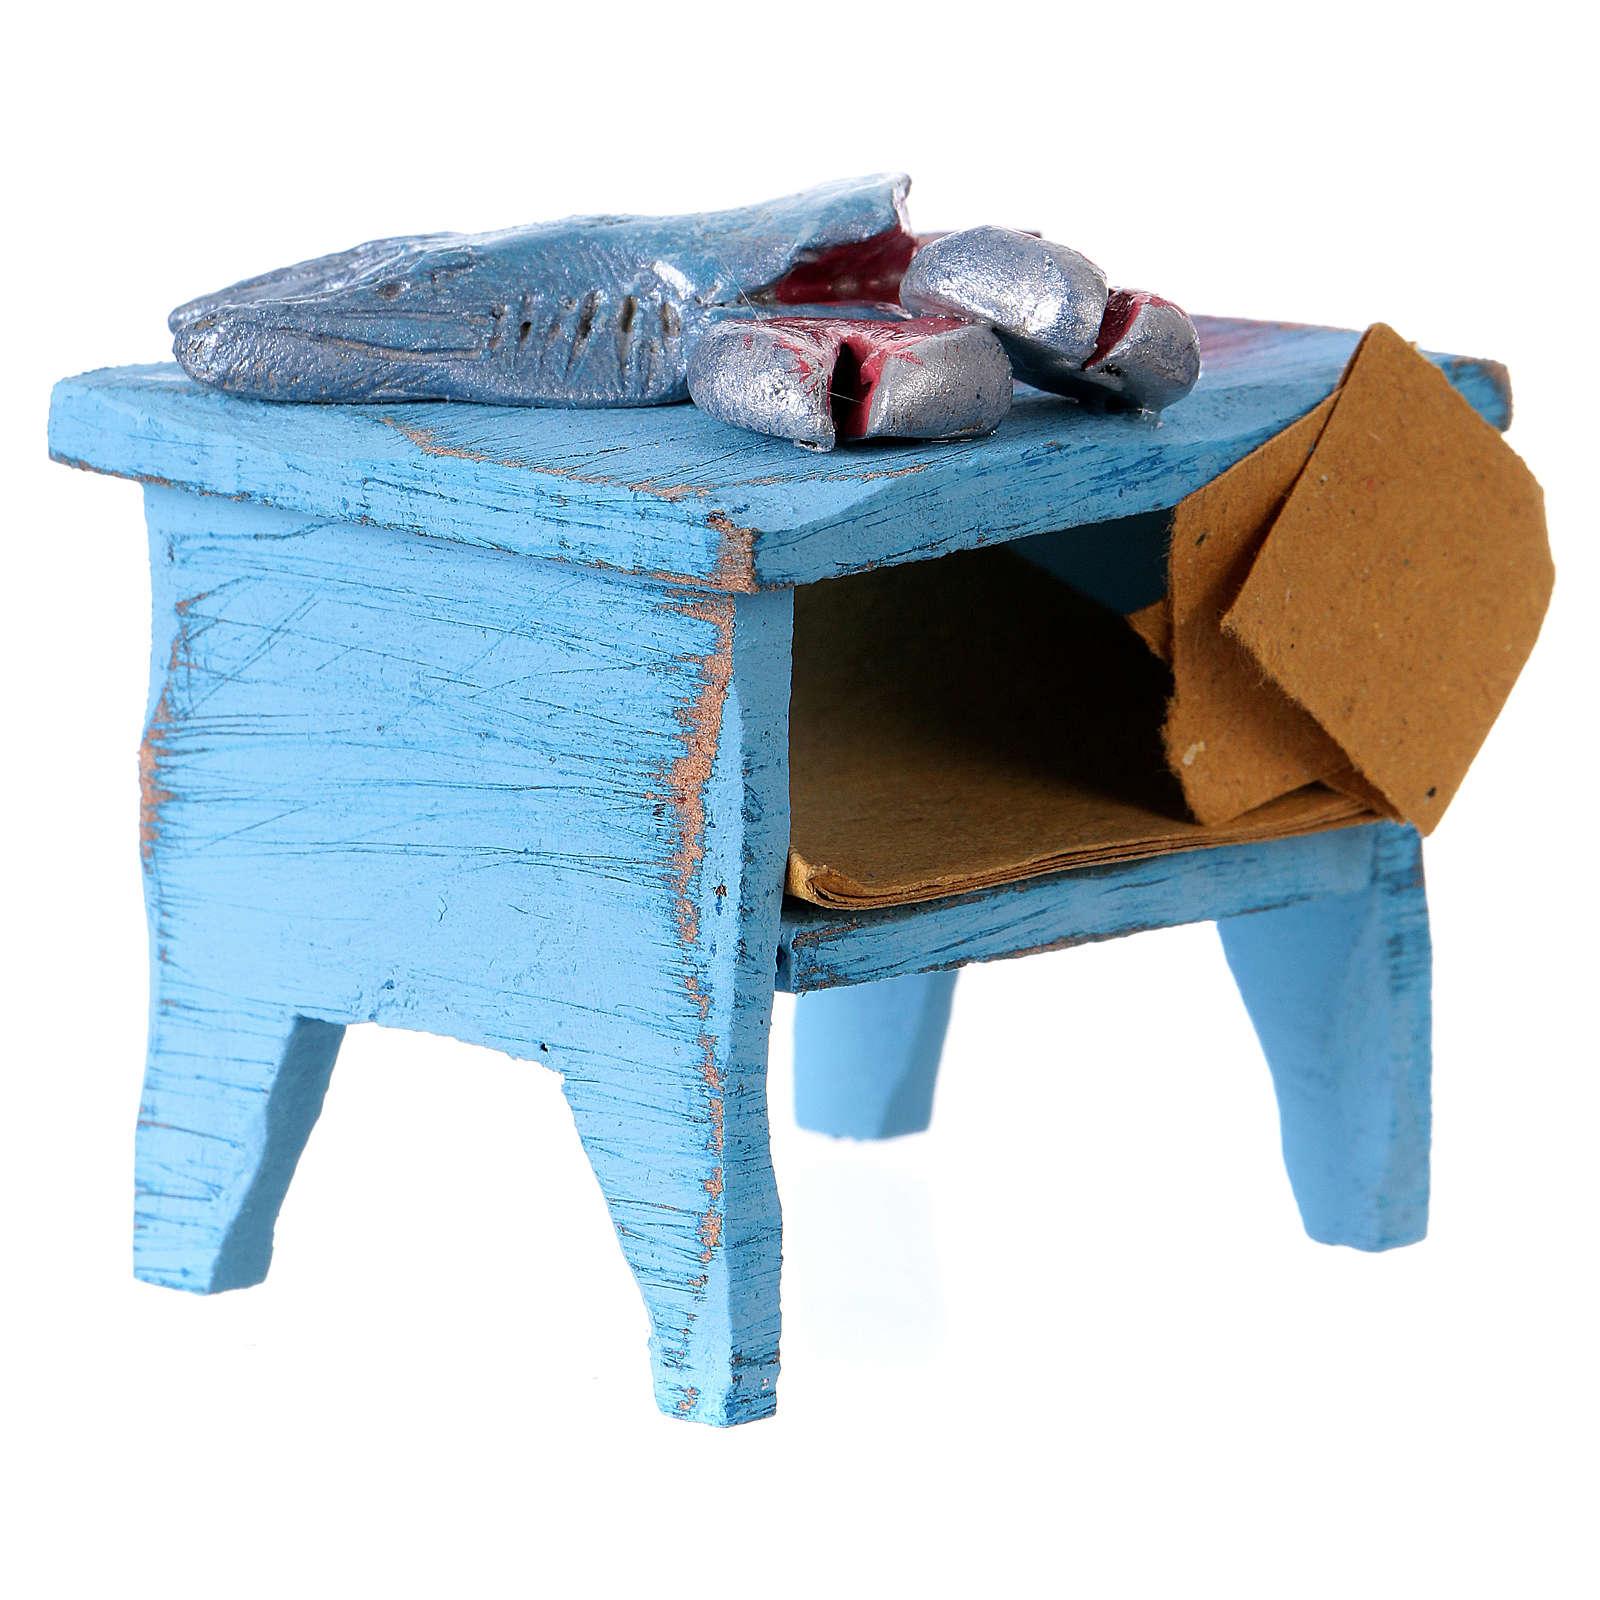 Swordfish vendor table, for 10 cm nativity 4